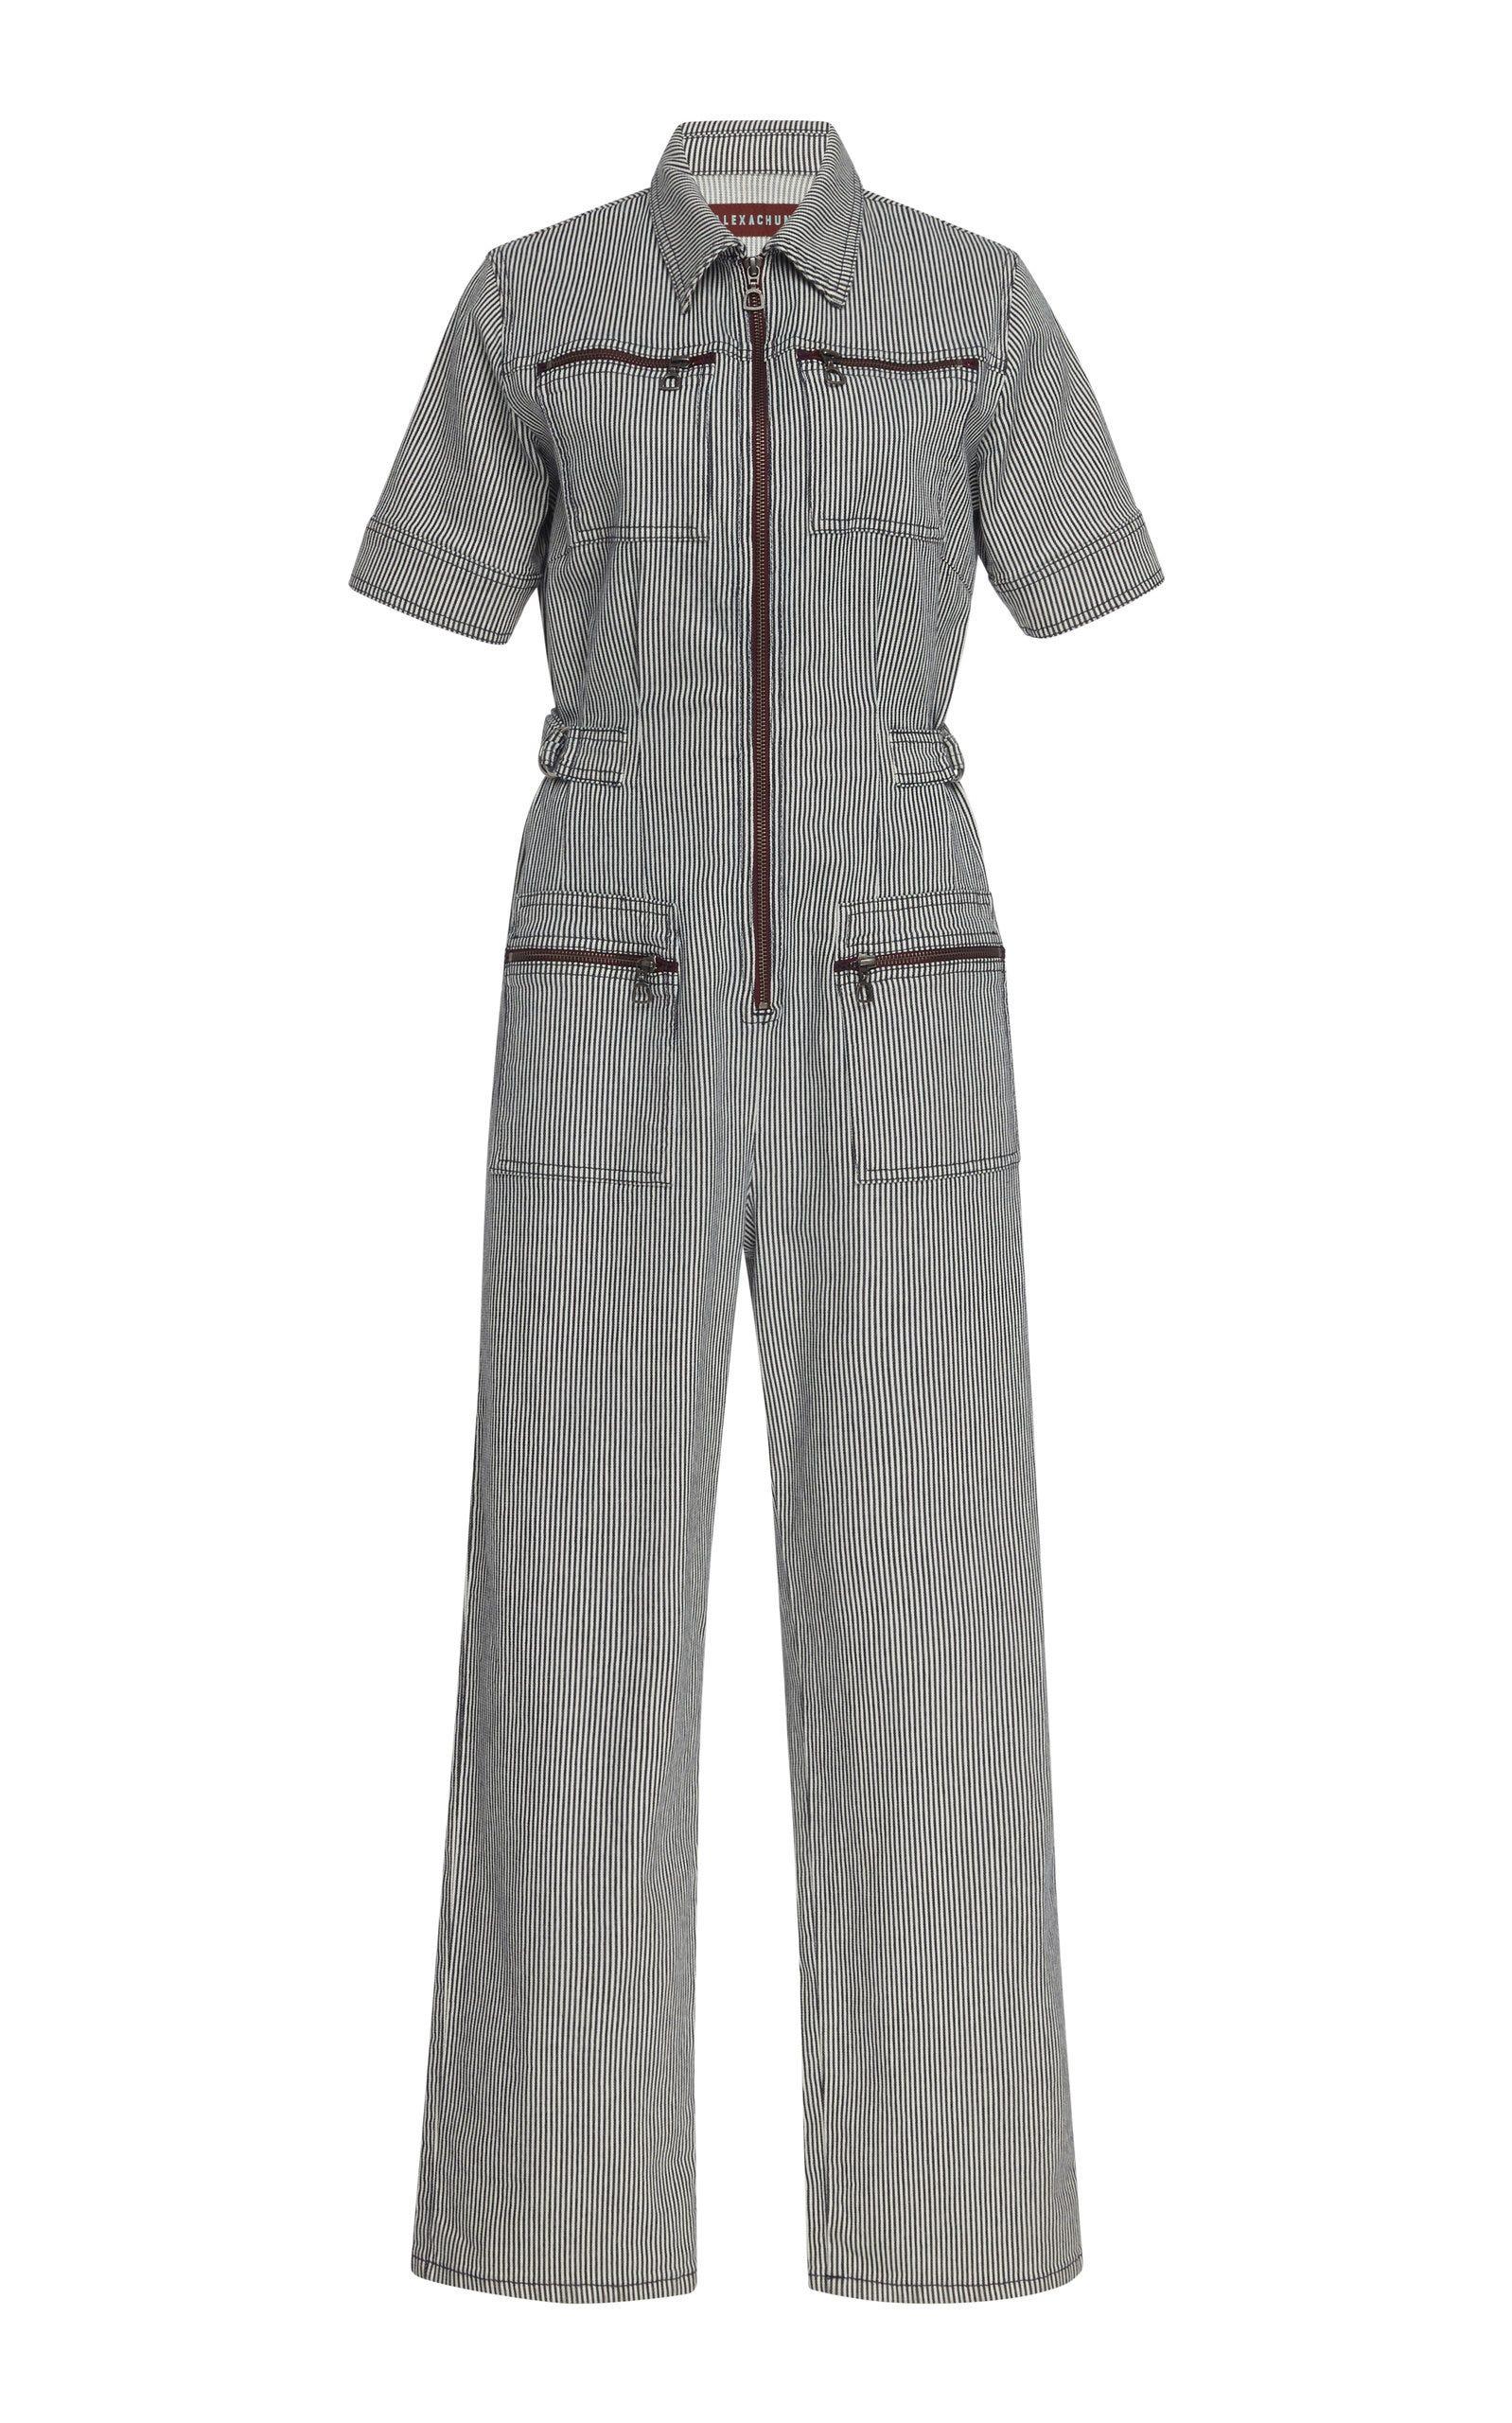 7434953234 Best Womens Boiler Suits